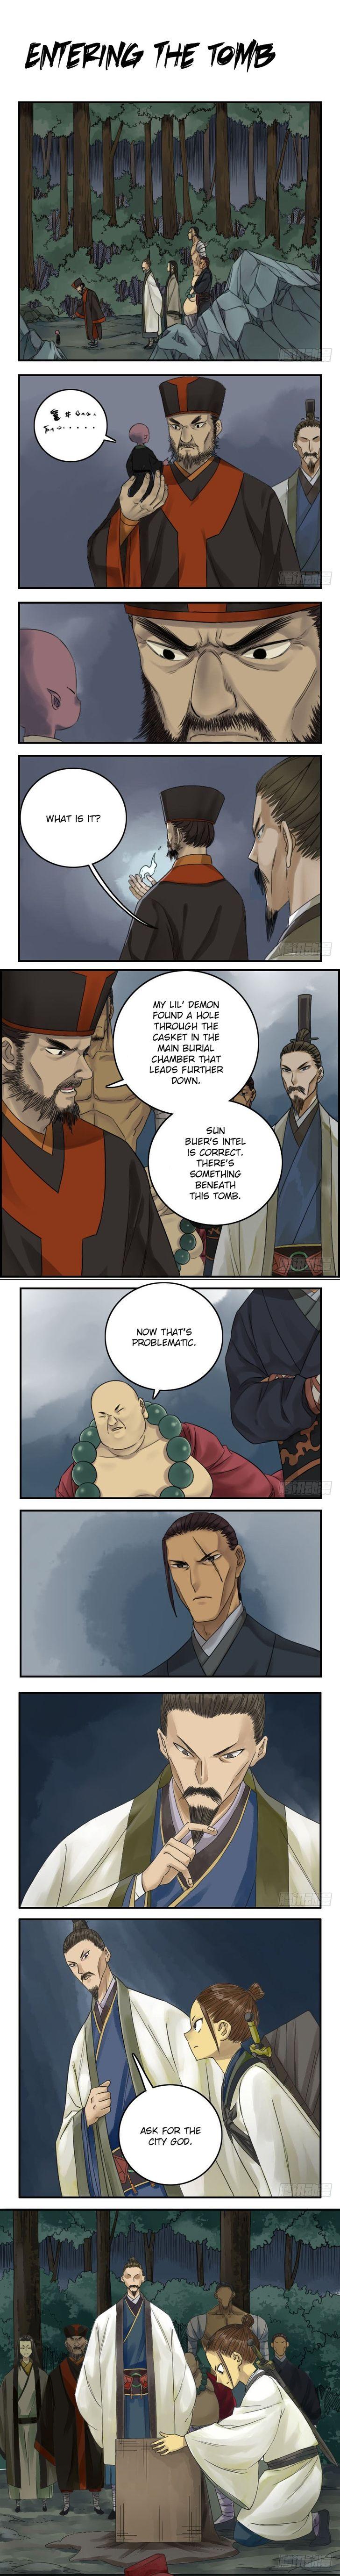 Martial Legacy 50: Entering the Tomb at MangaFox